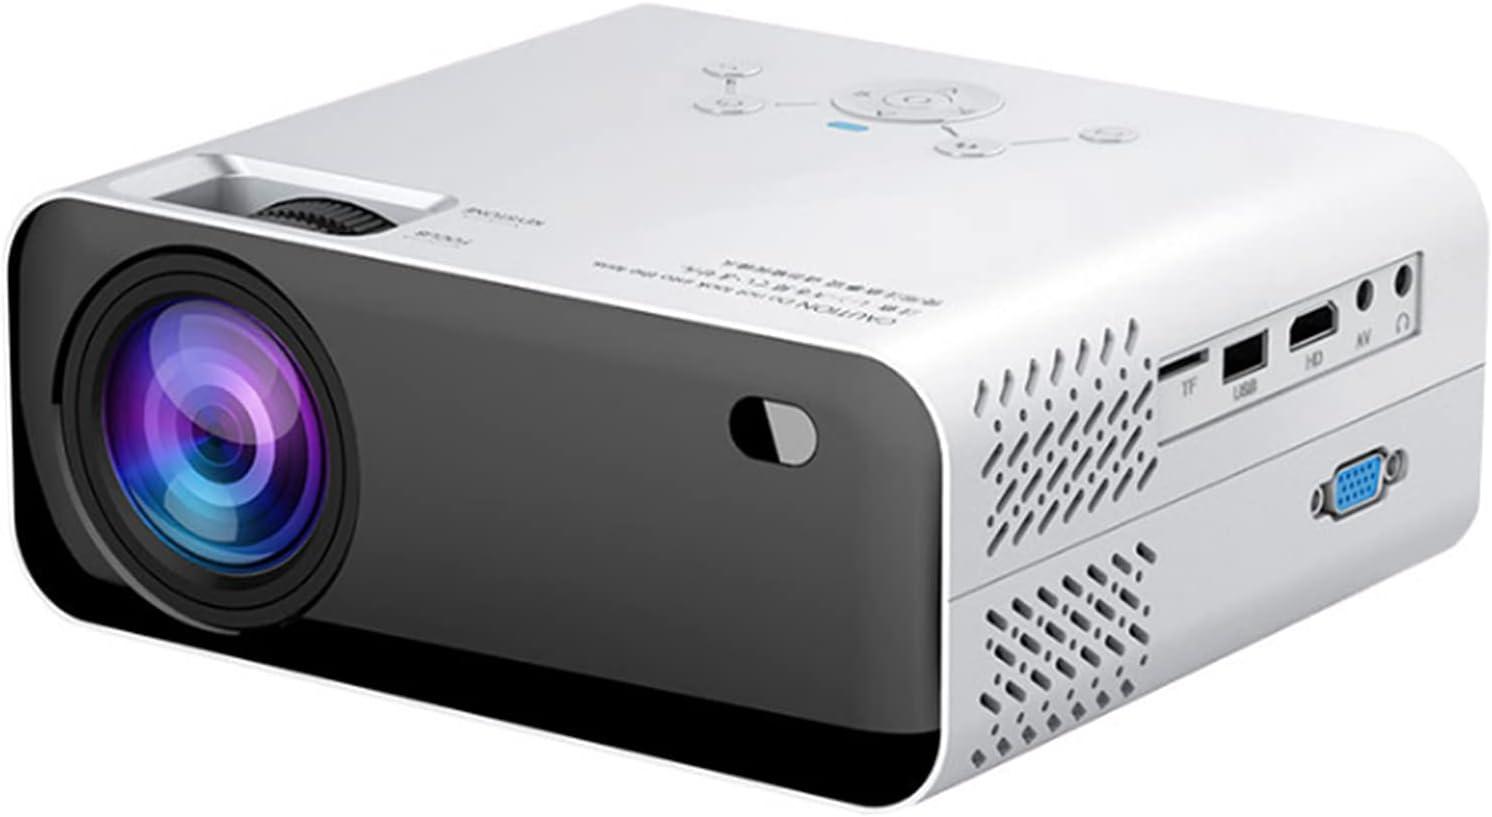 Mini proiettore HOPVISION 1080P Discount is 1 year warranty also underway videoproiettore HD Portabl Full